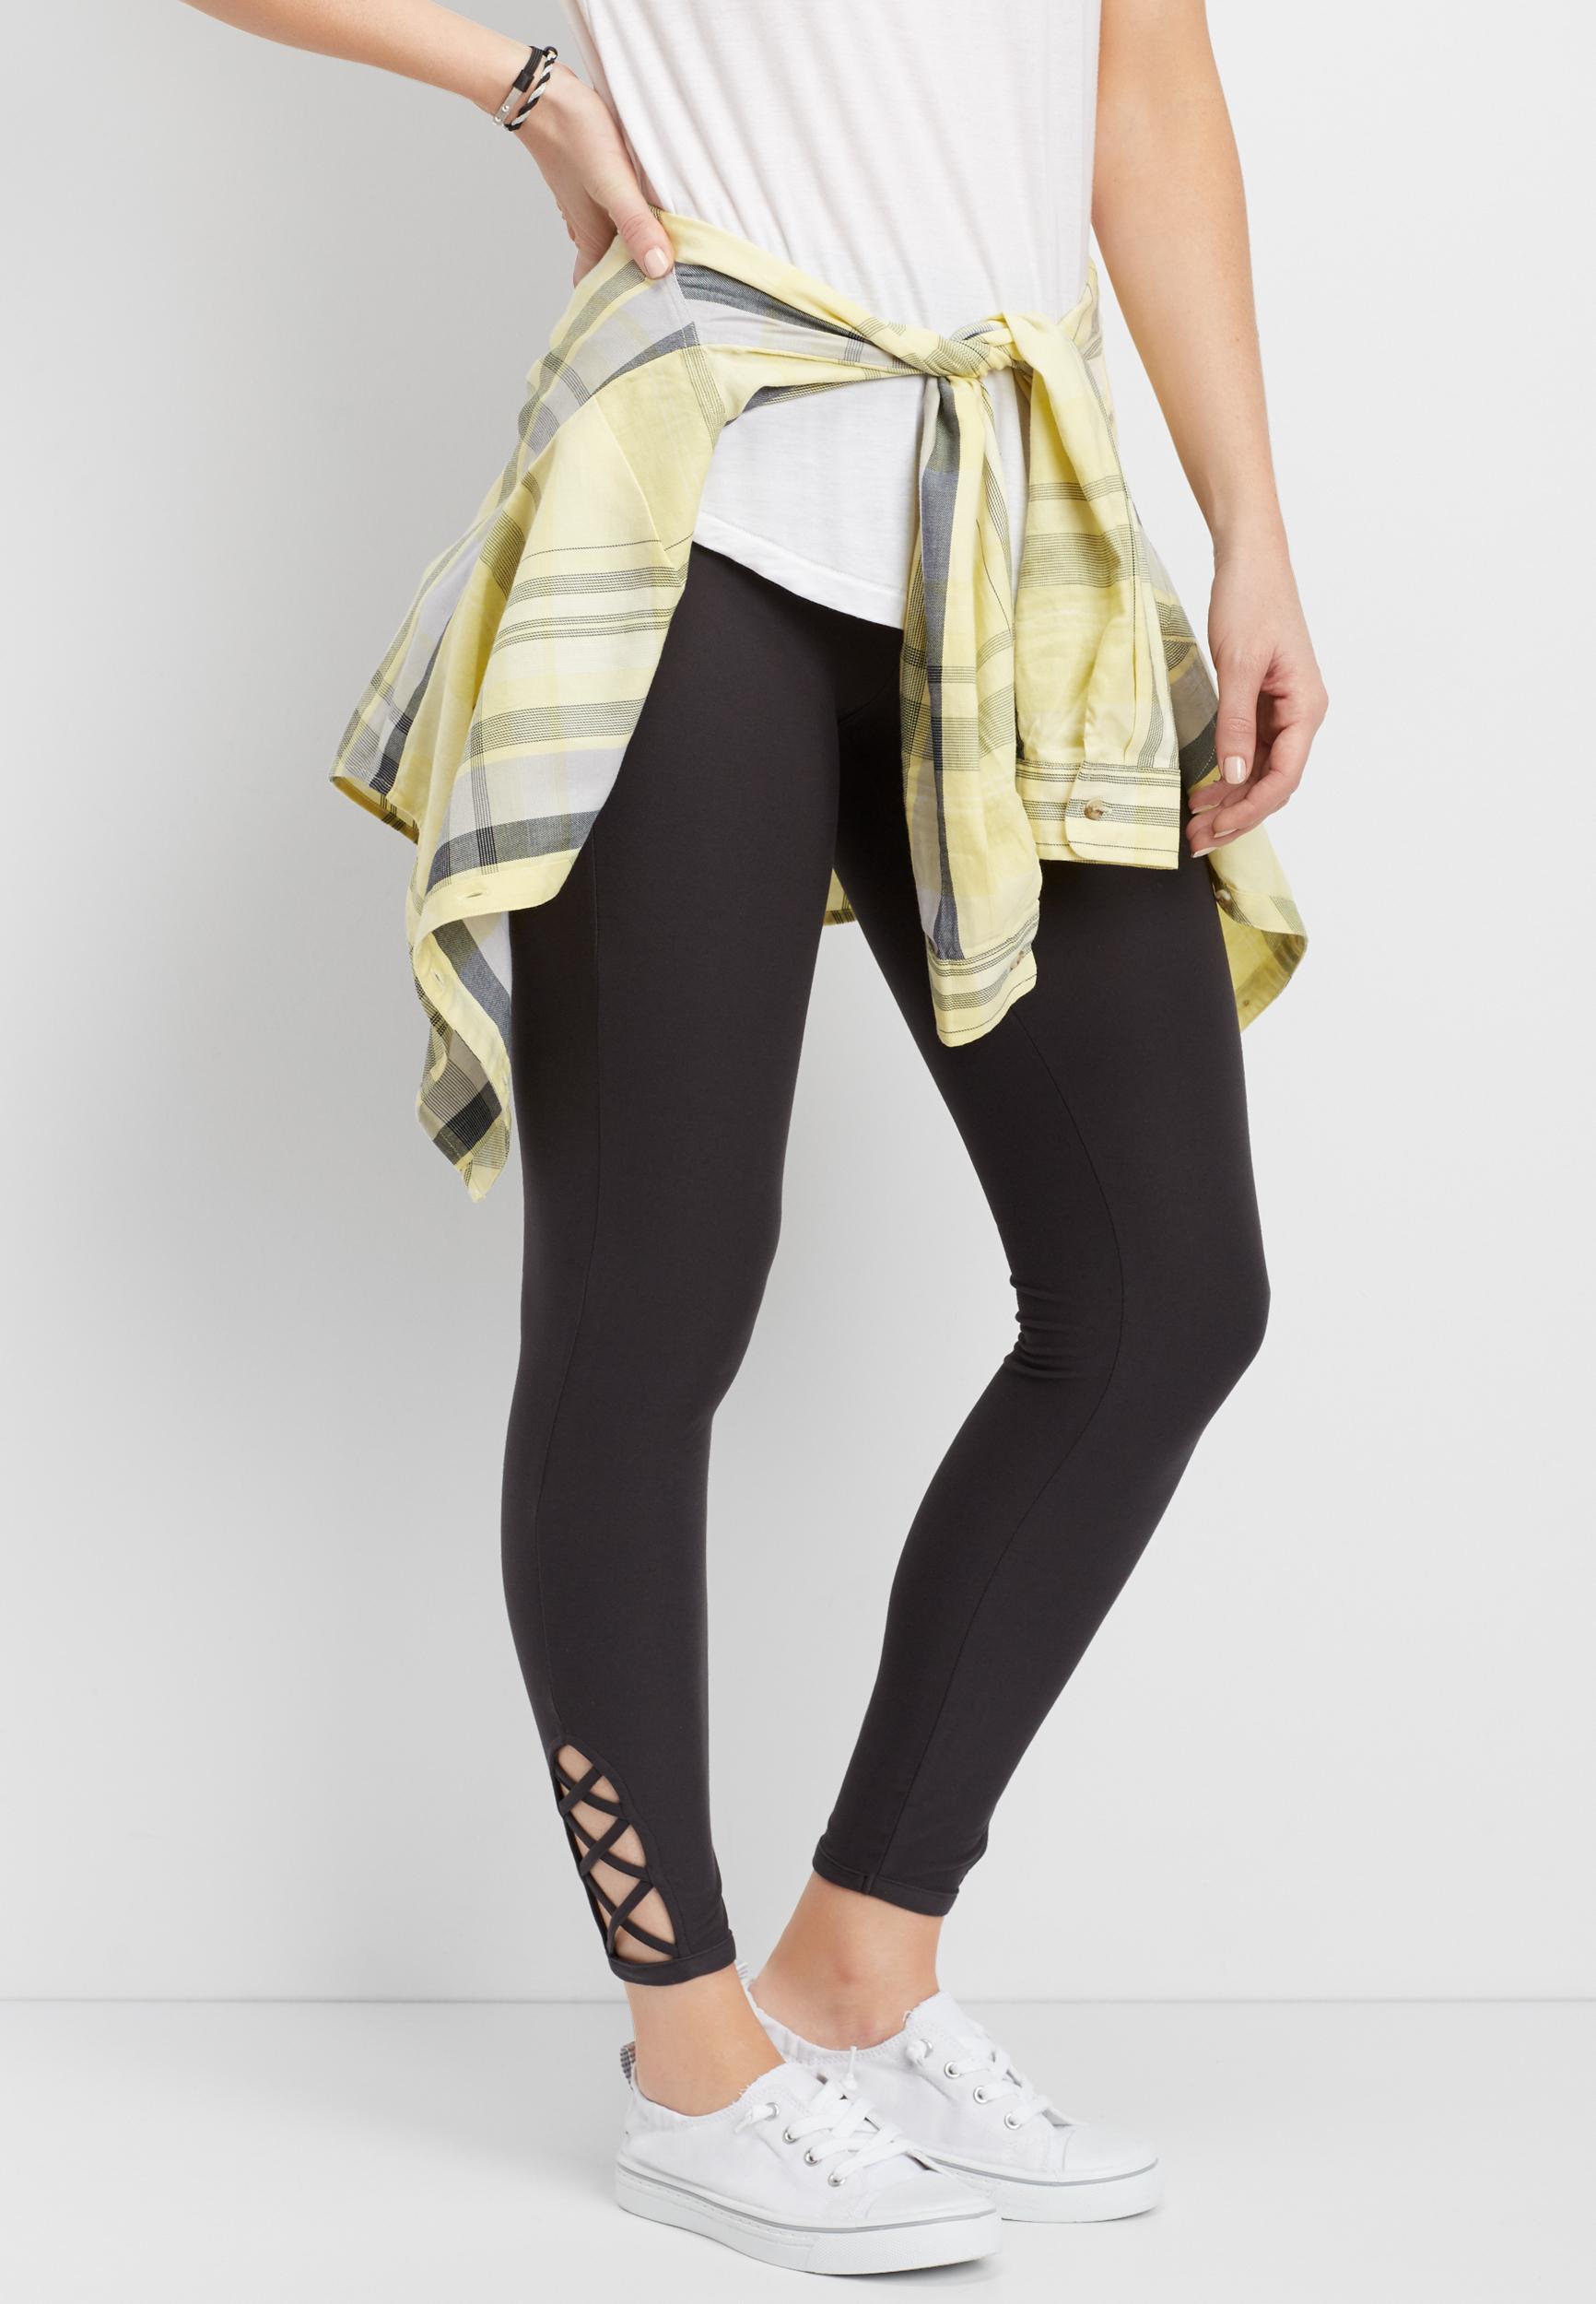 Ultra-Soft 7/8 Lattice Side Legging Maurices